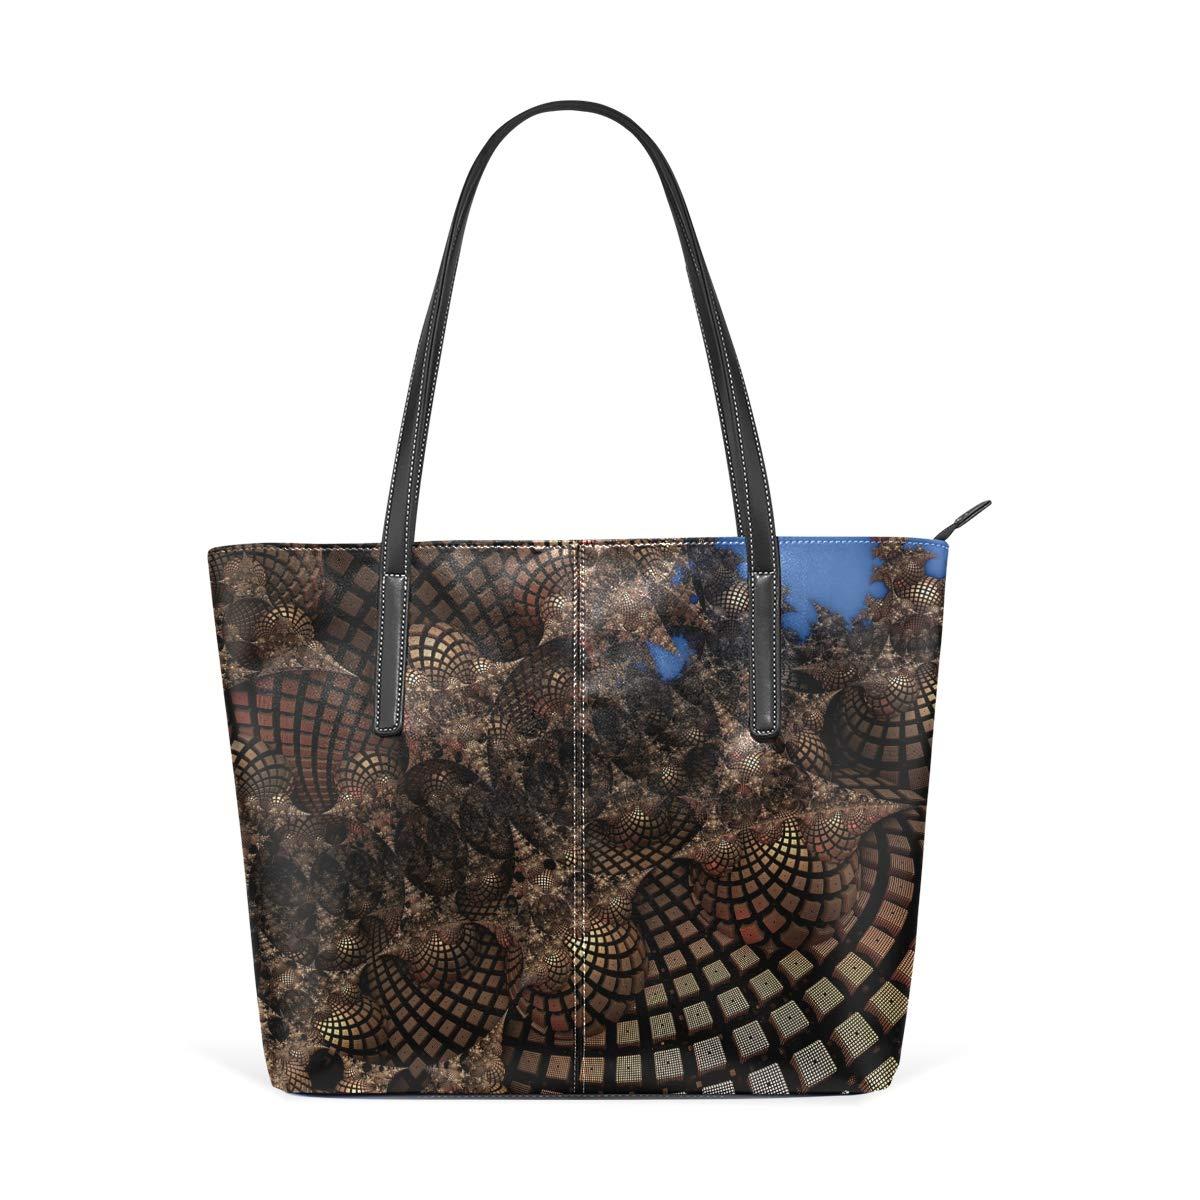 Heart Leather Top Handle Satchel Girl Handbag Shoulder Tote Bag for Girls Women